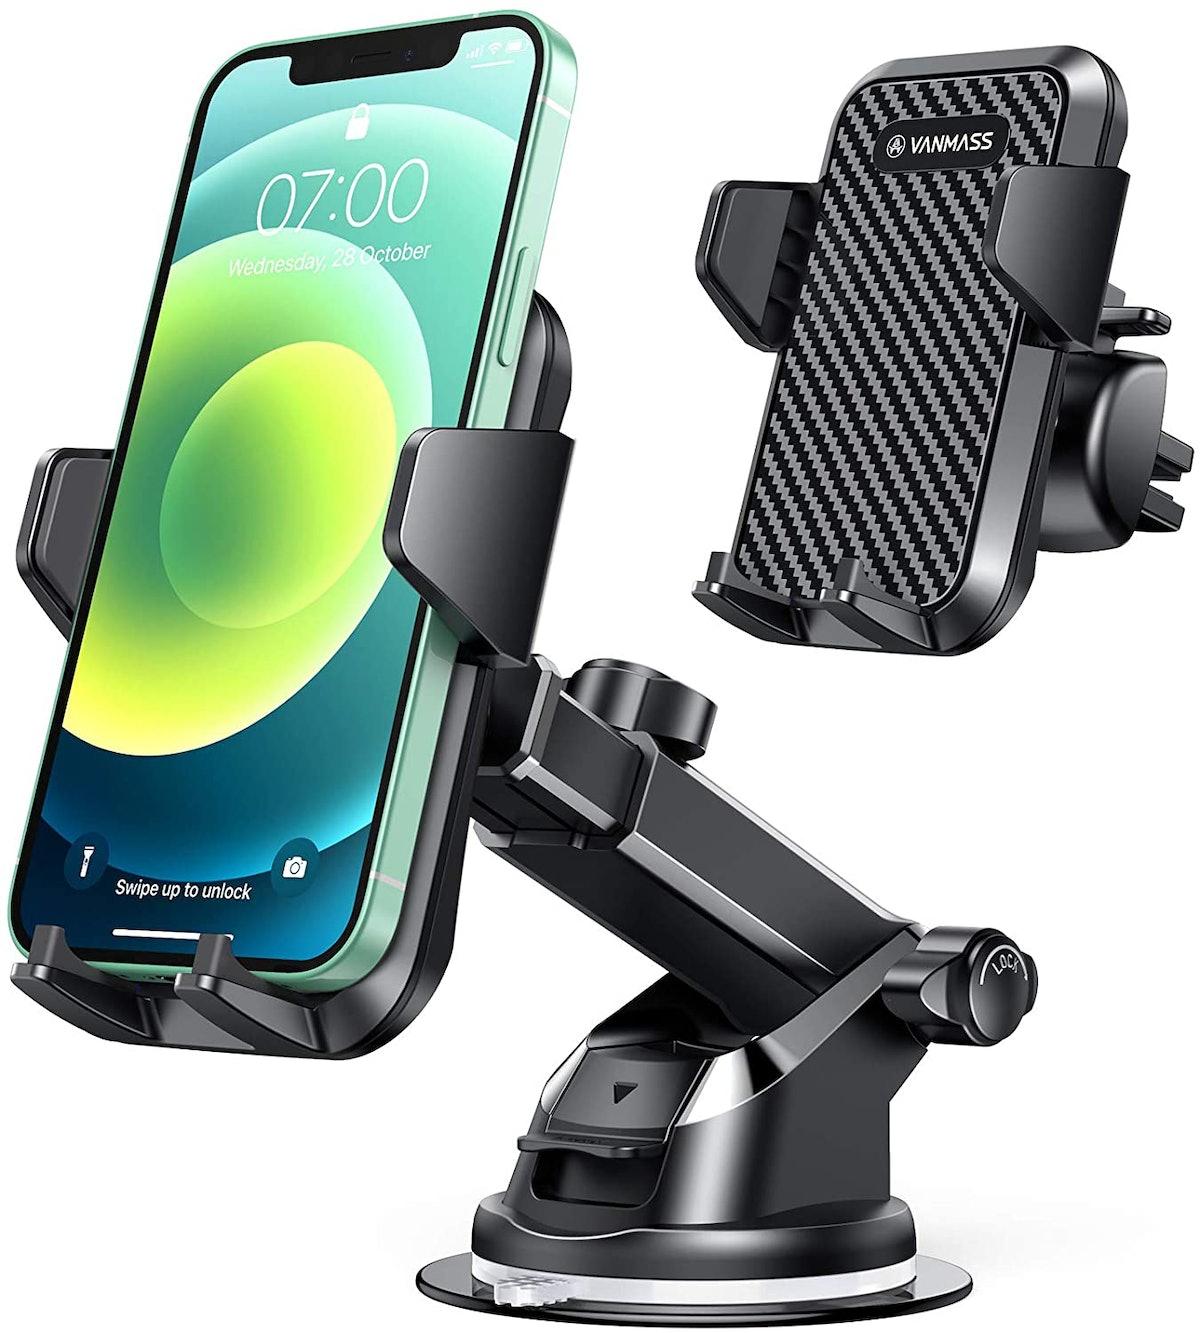 VANMASS Universal Car Phone Mount